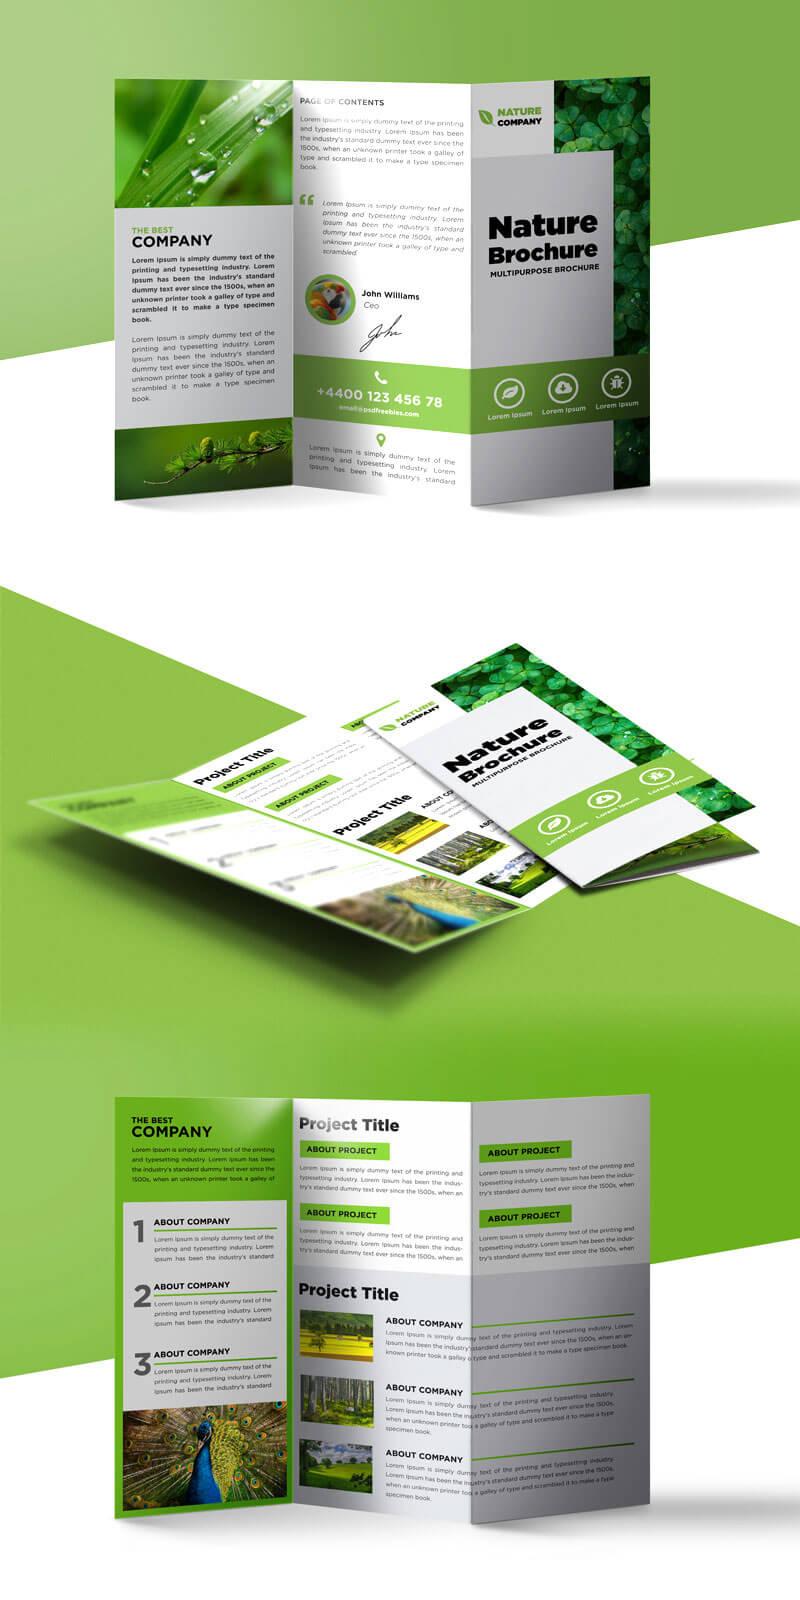 018 Template Ideas Tri Fold Brochure Free Psd Magnificent Throughout 3 Fold Brochure Template Psd